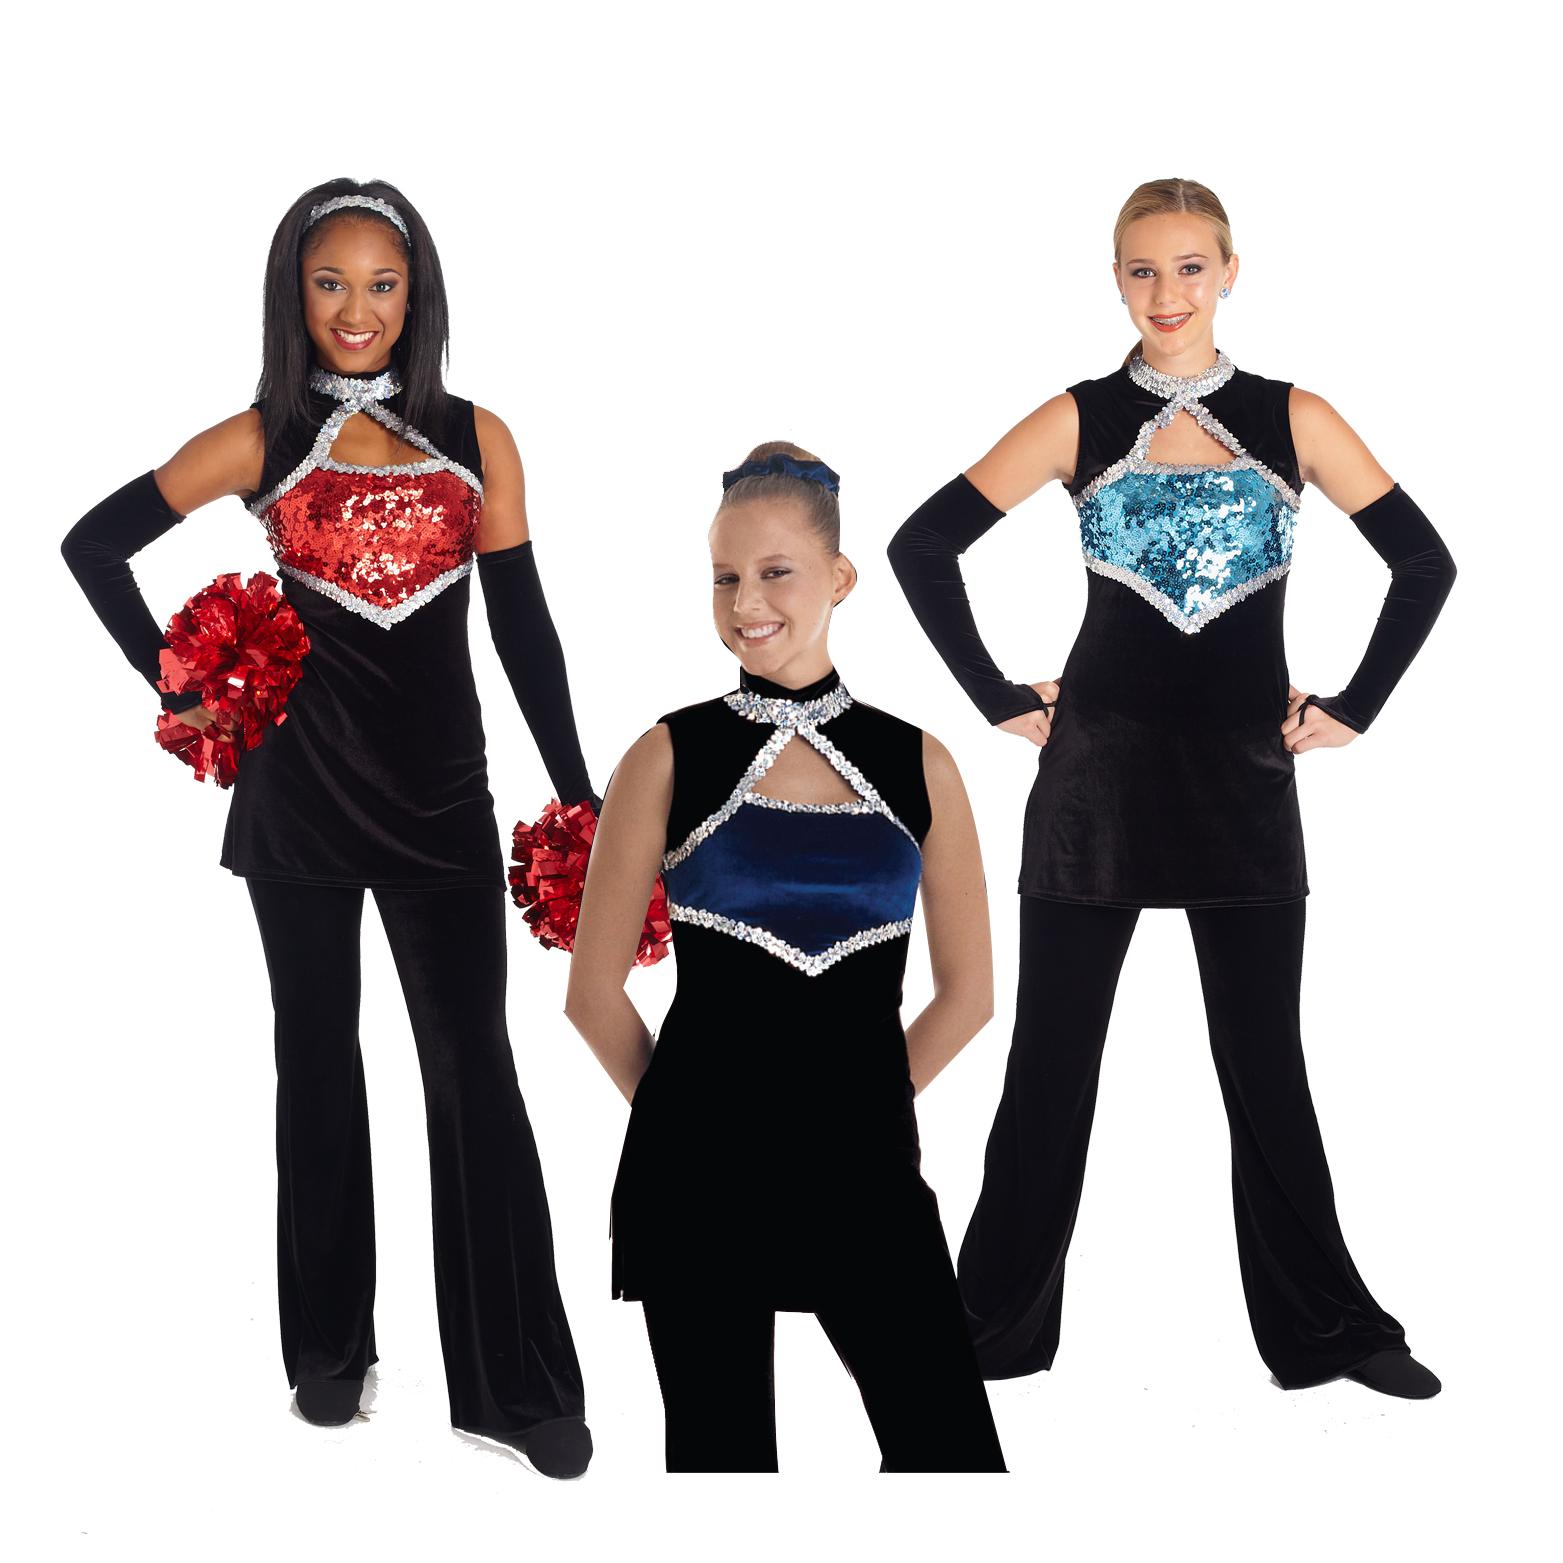 Guard Uniforms: Irresistible Tunic